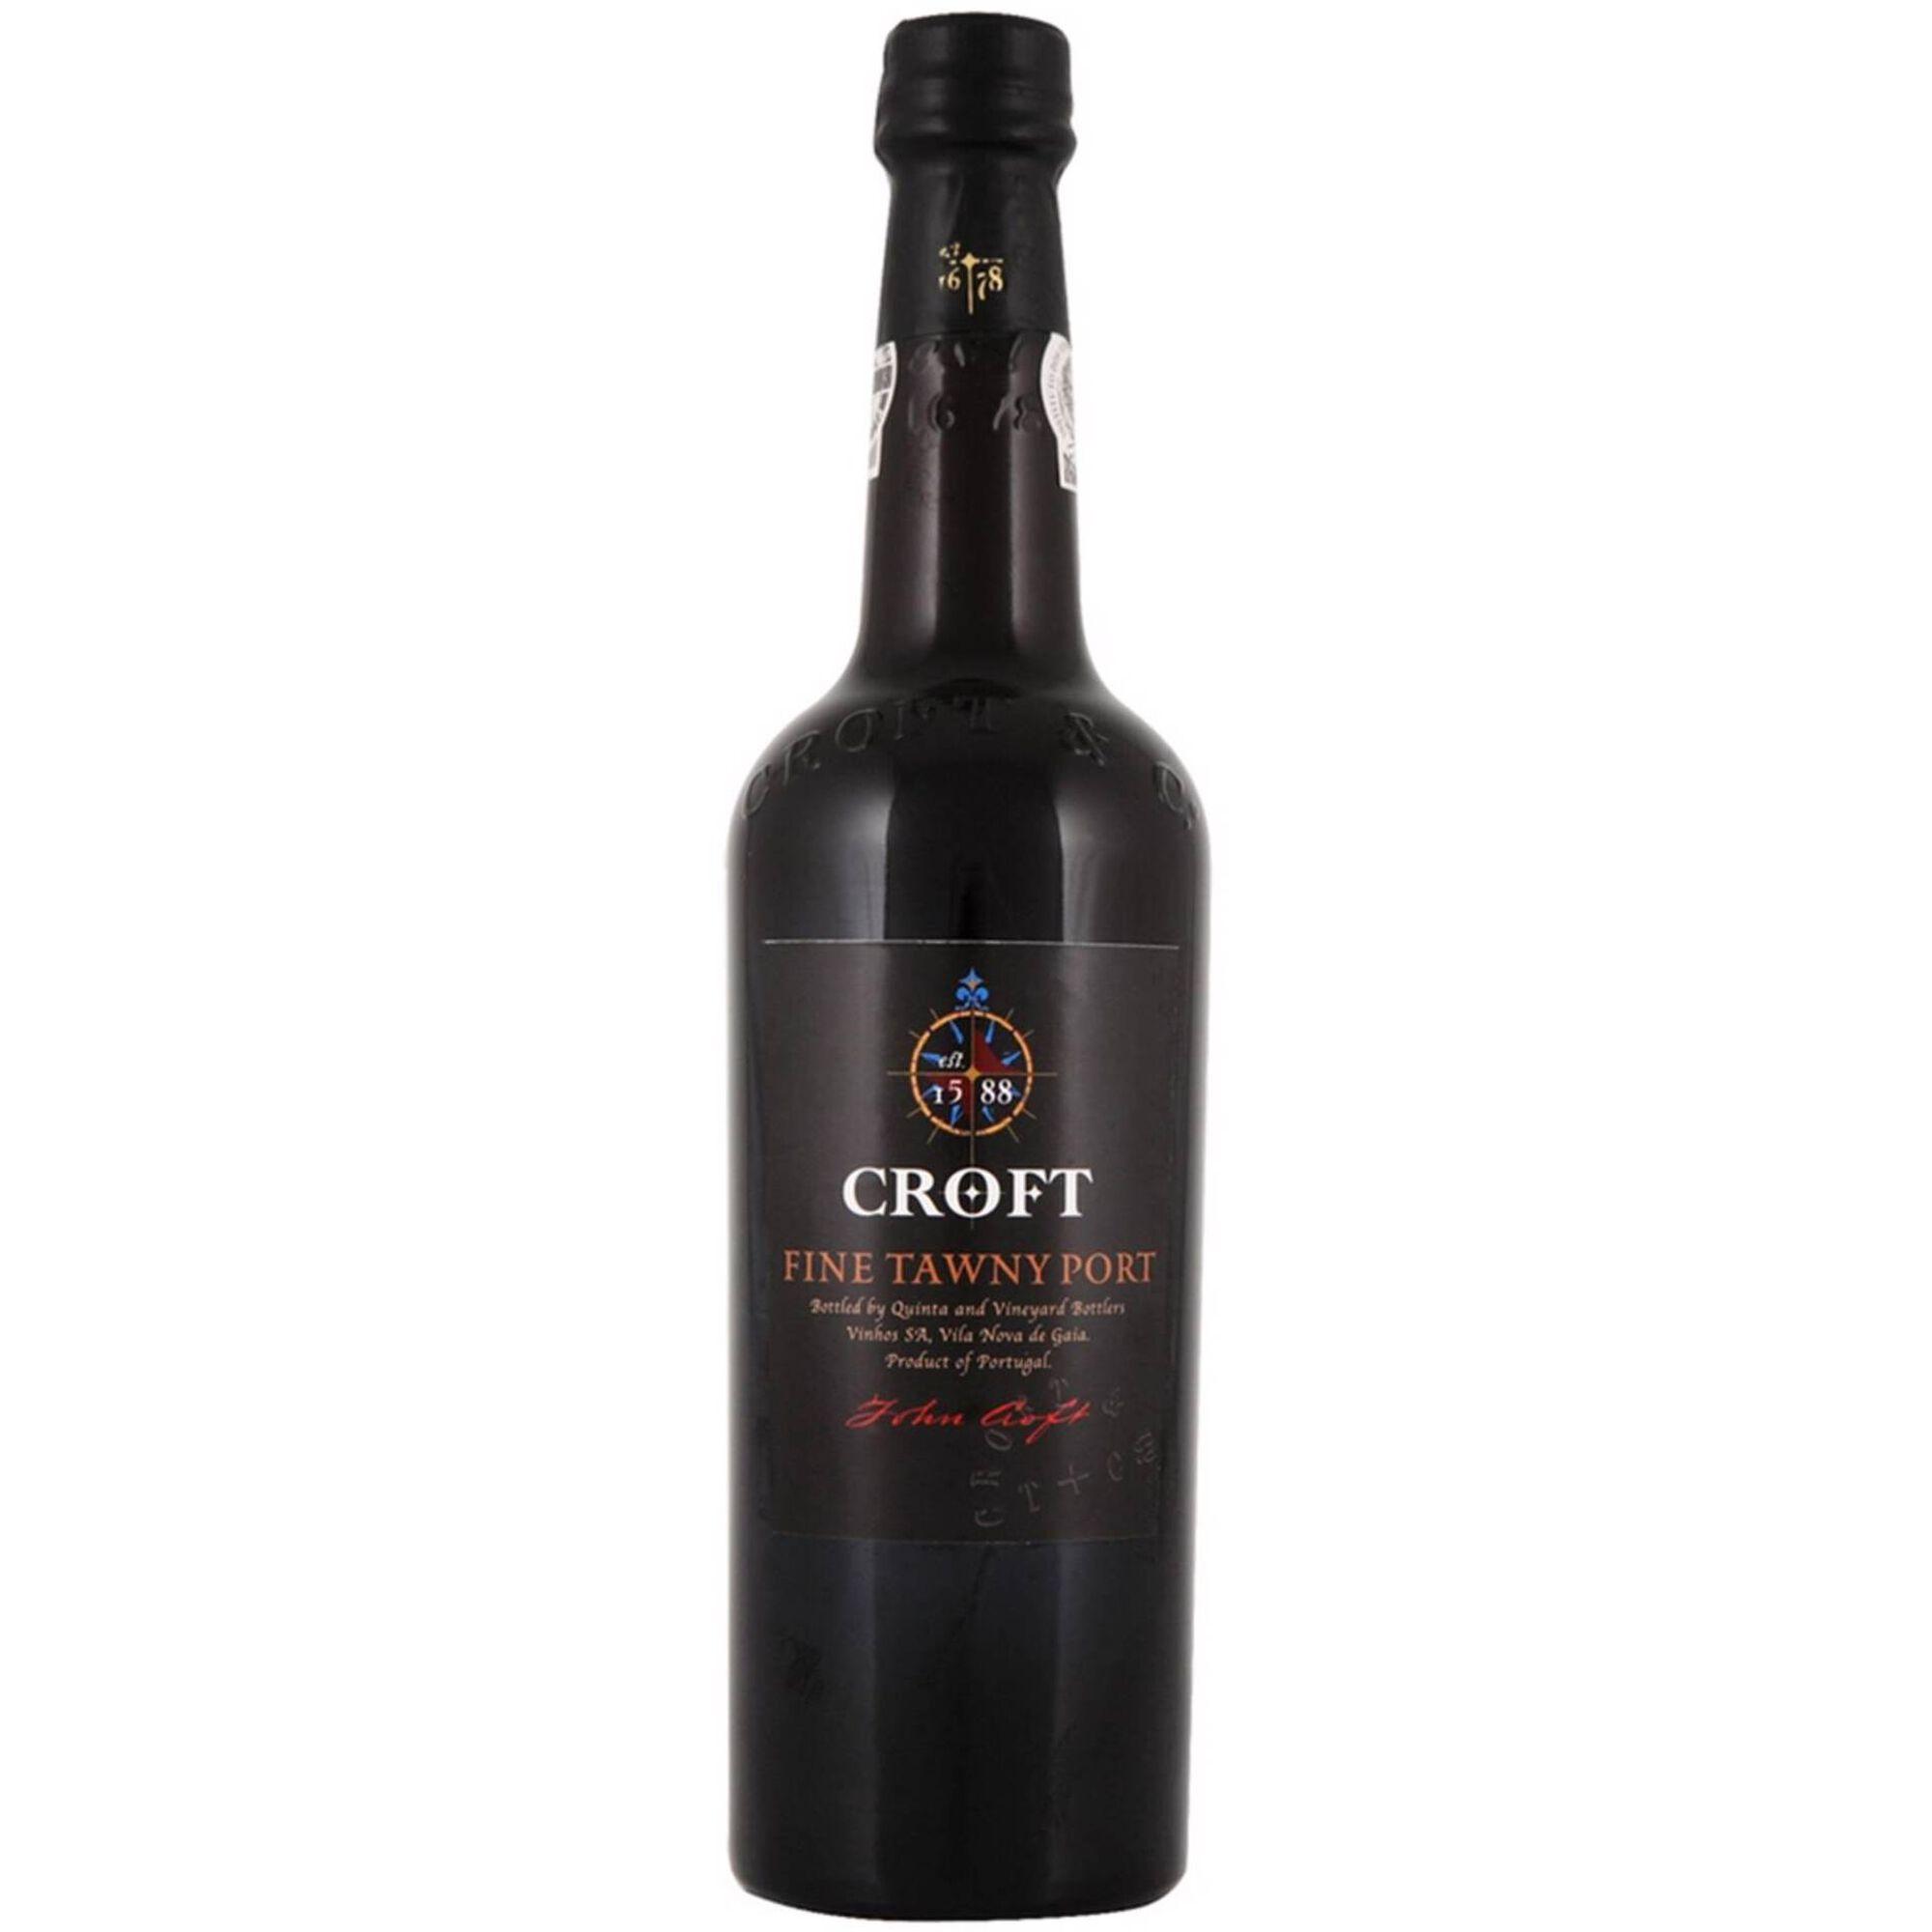 Croft Vinho do Porto Tawny